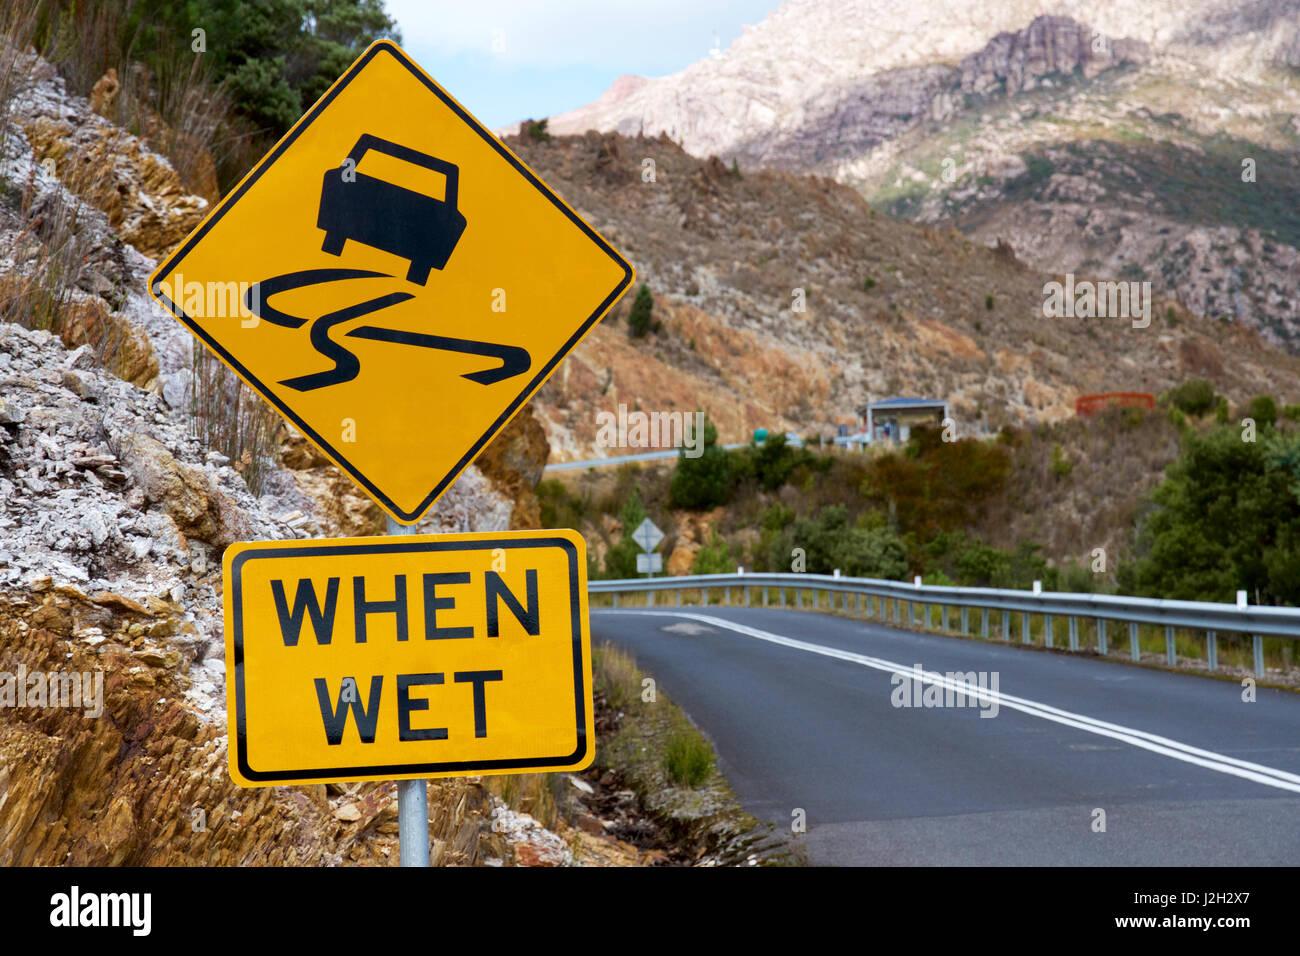 Slippery when wet sign in Tasmania, Australia - Stock Image